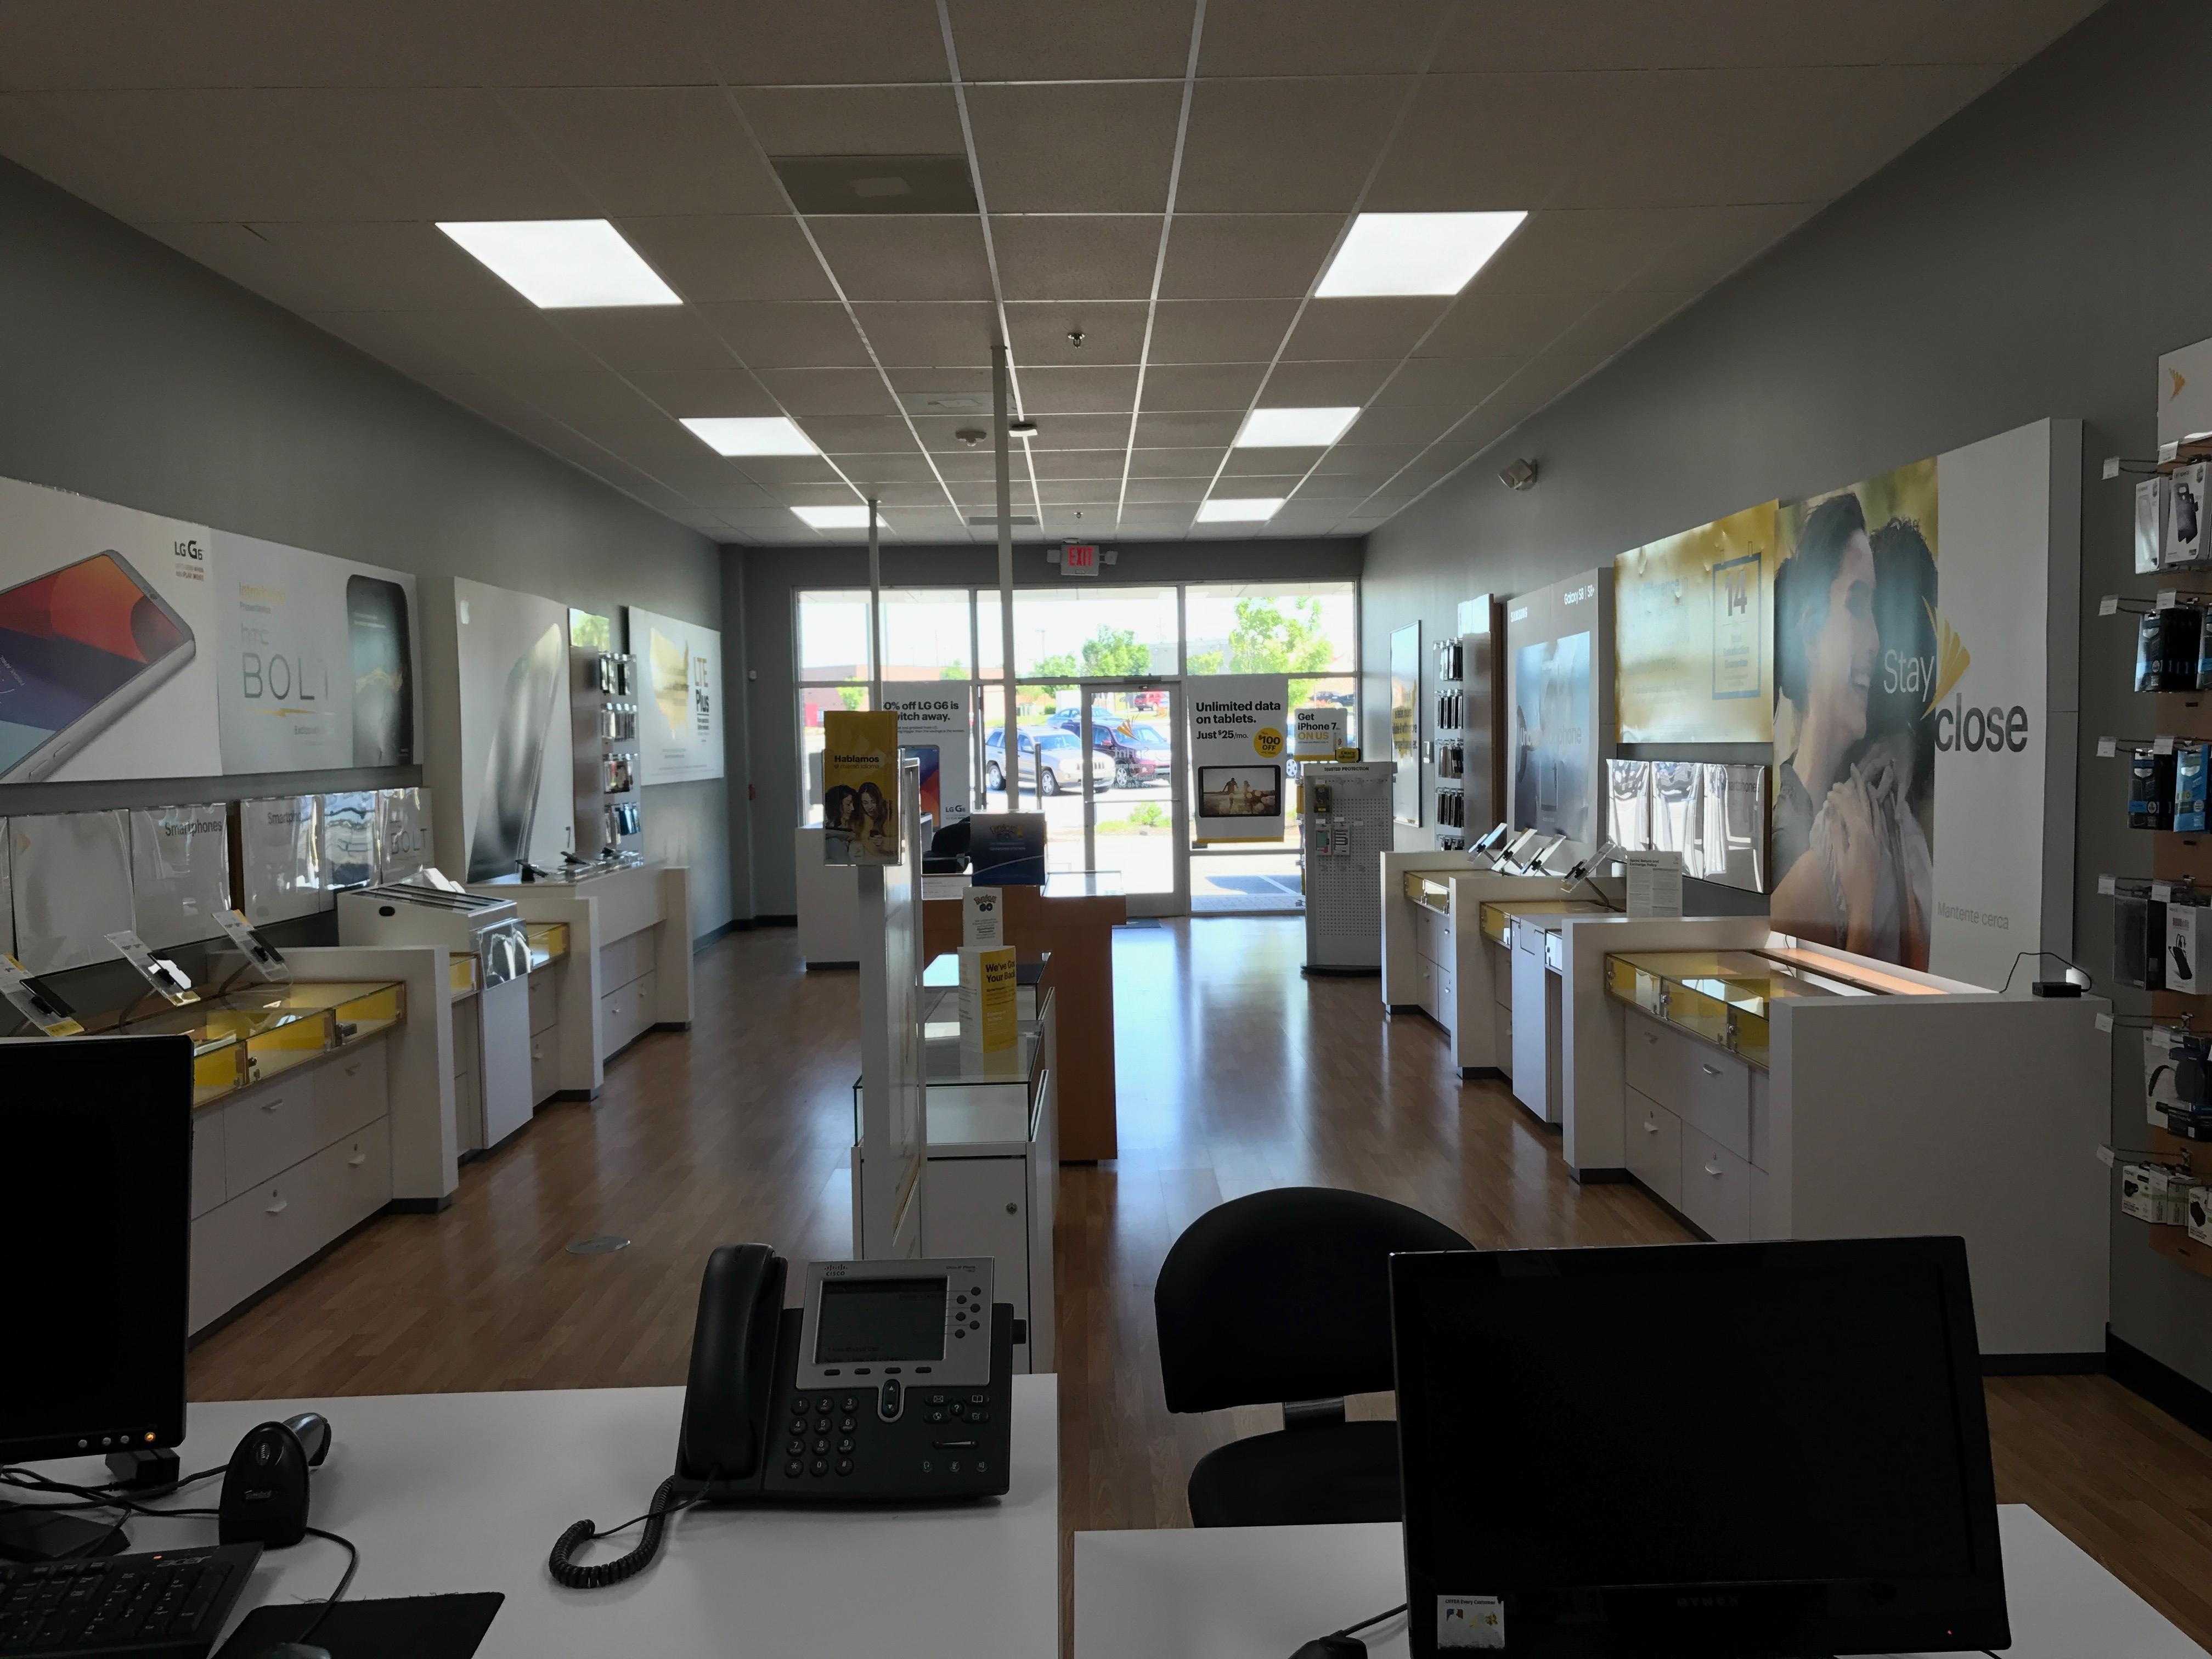 Sprint Store image 3